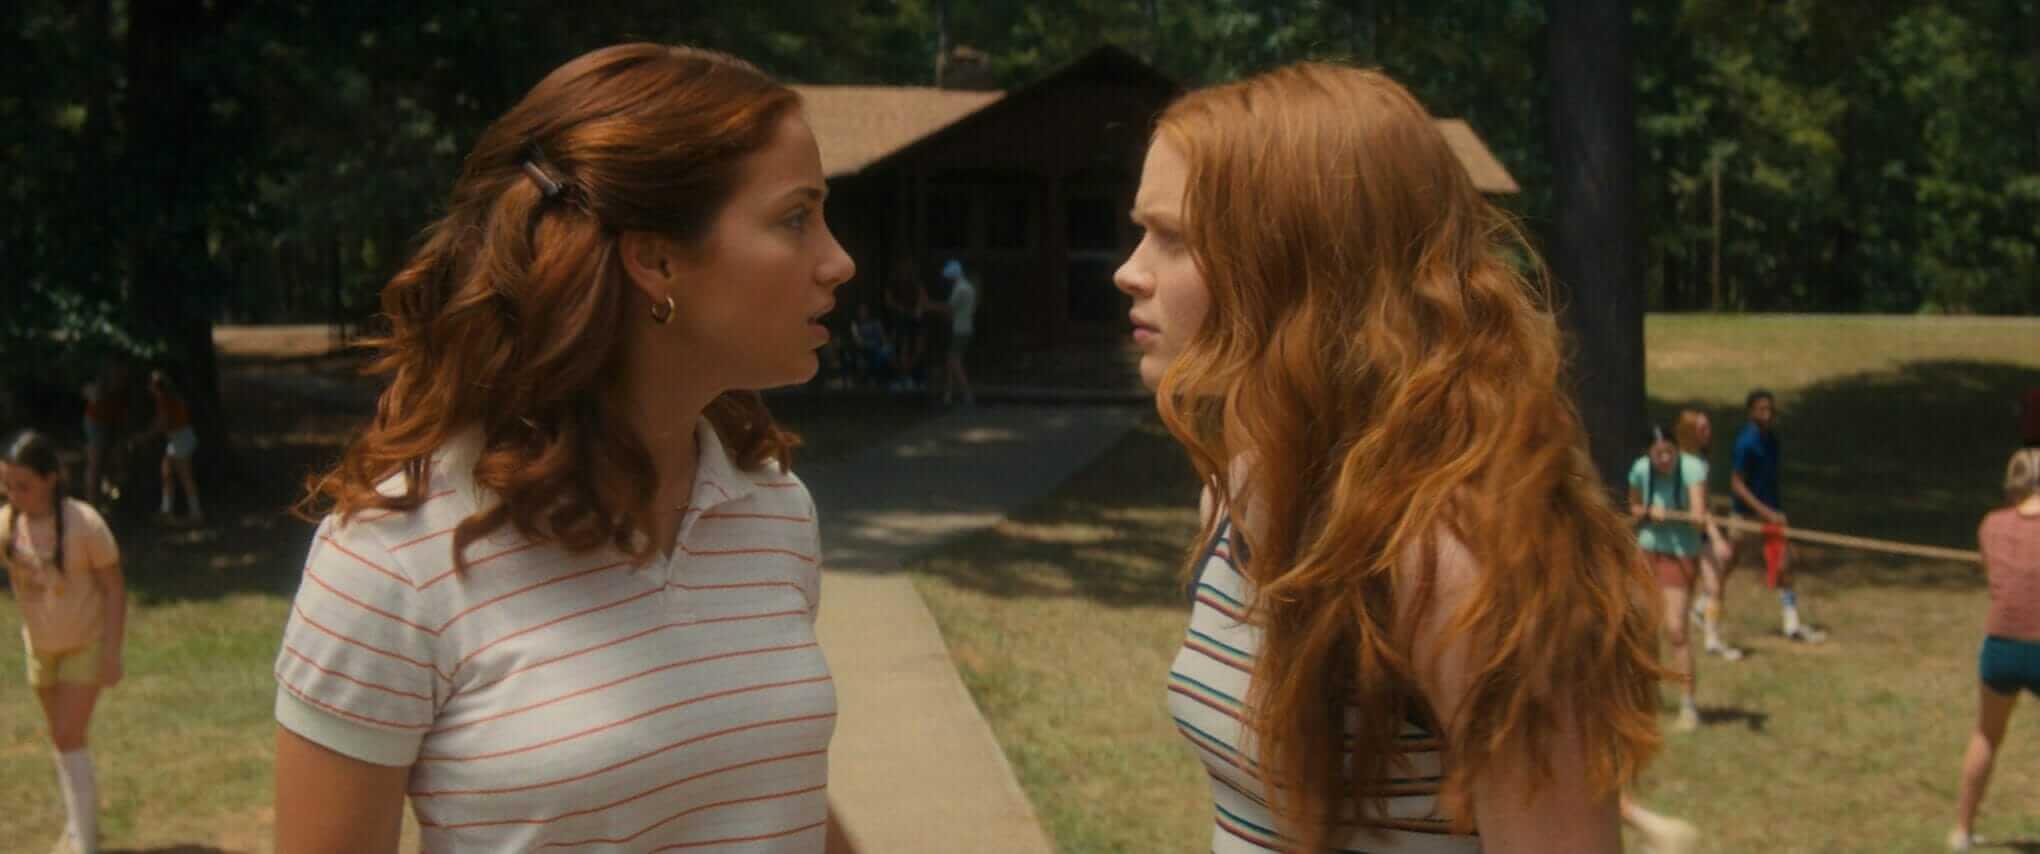 Fear_Street_Part_Two_1978-Netflix-2021-sisters